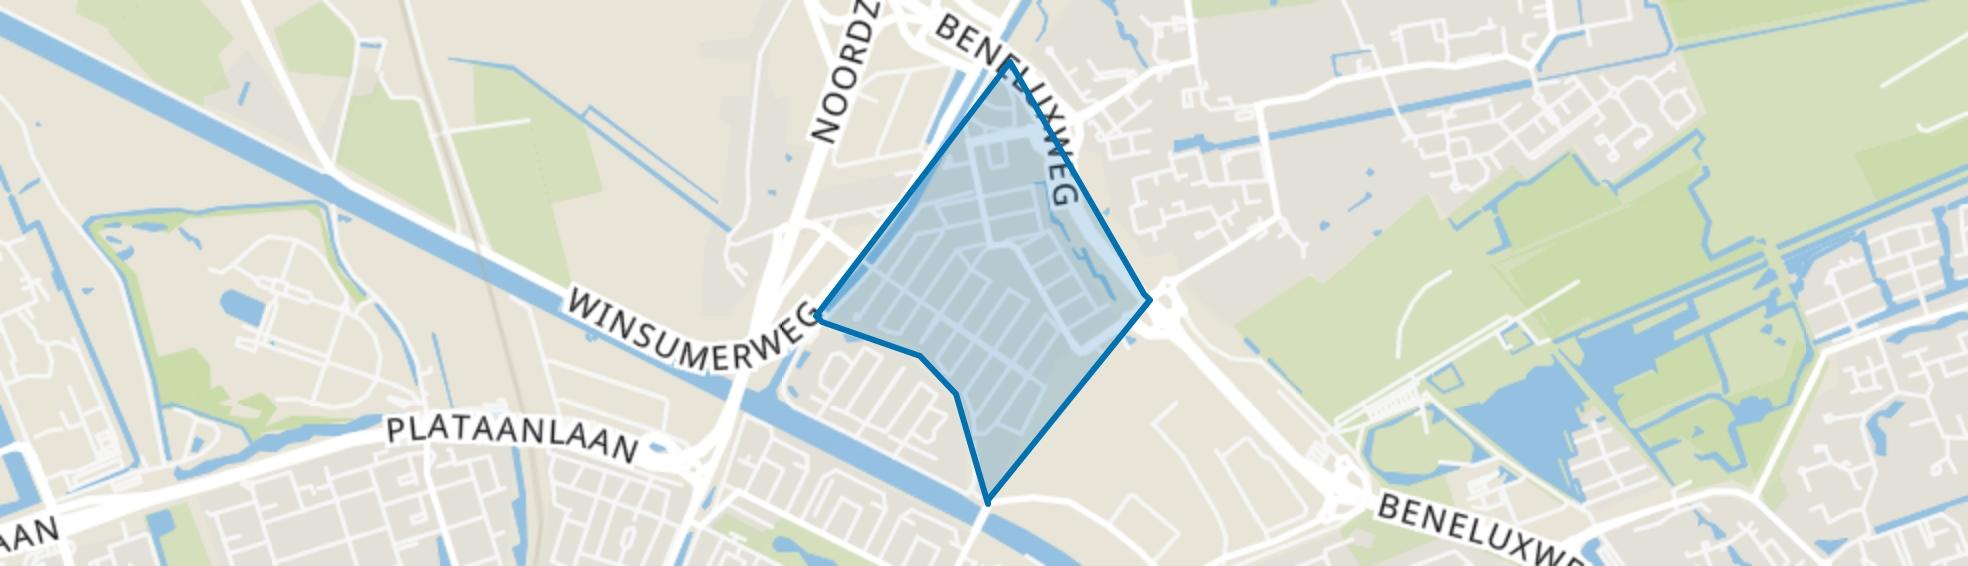 De Hunze, Groningen map